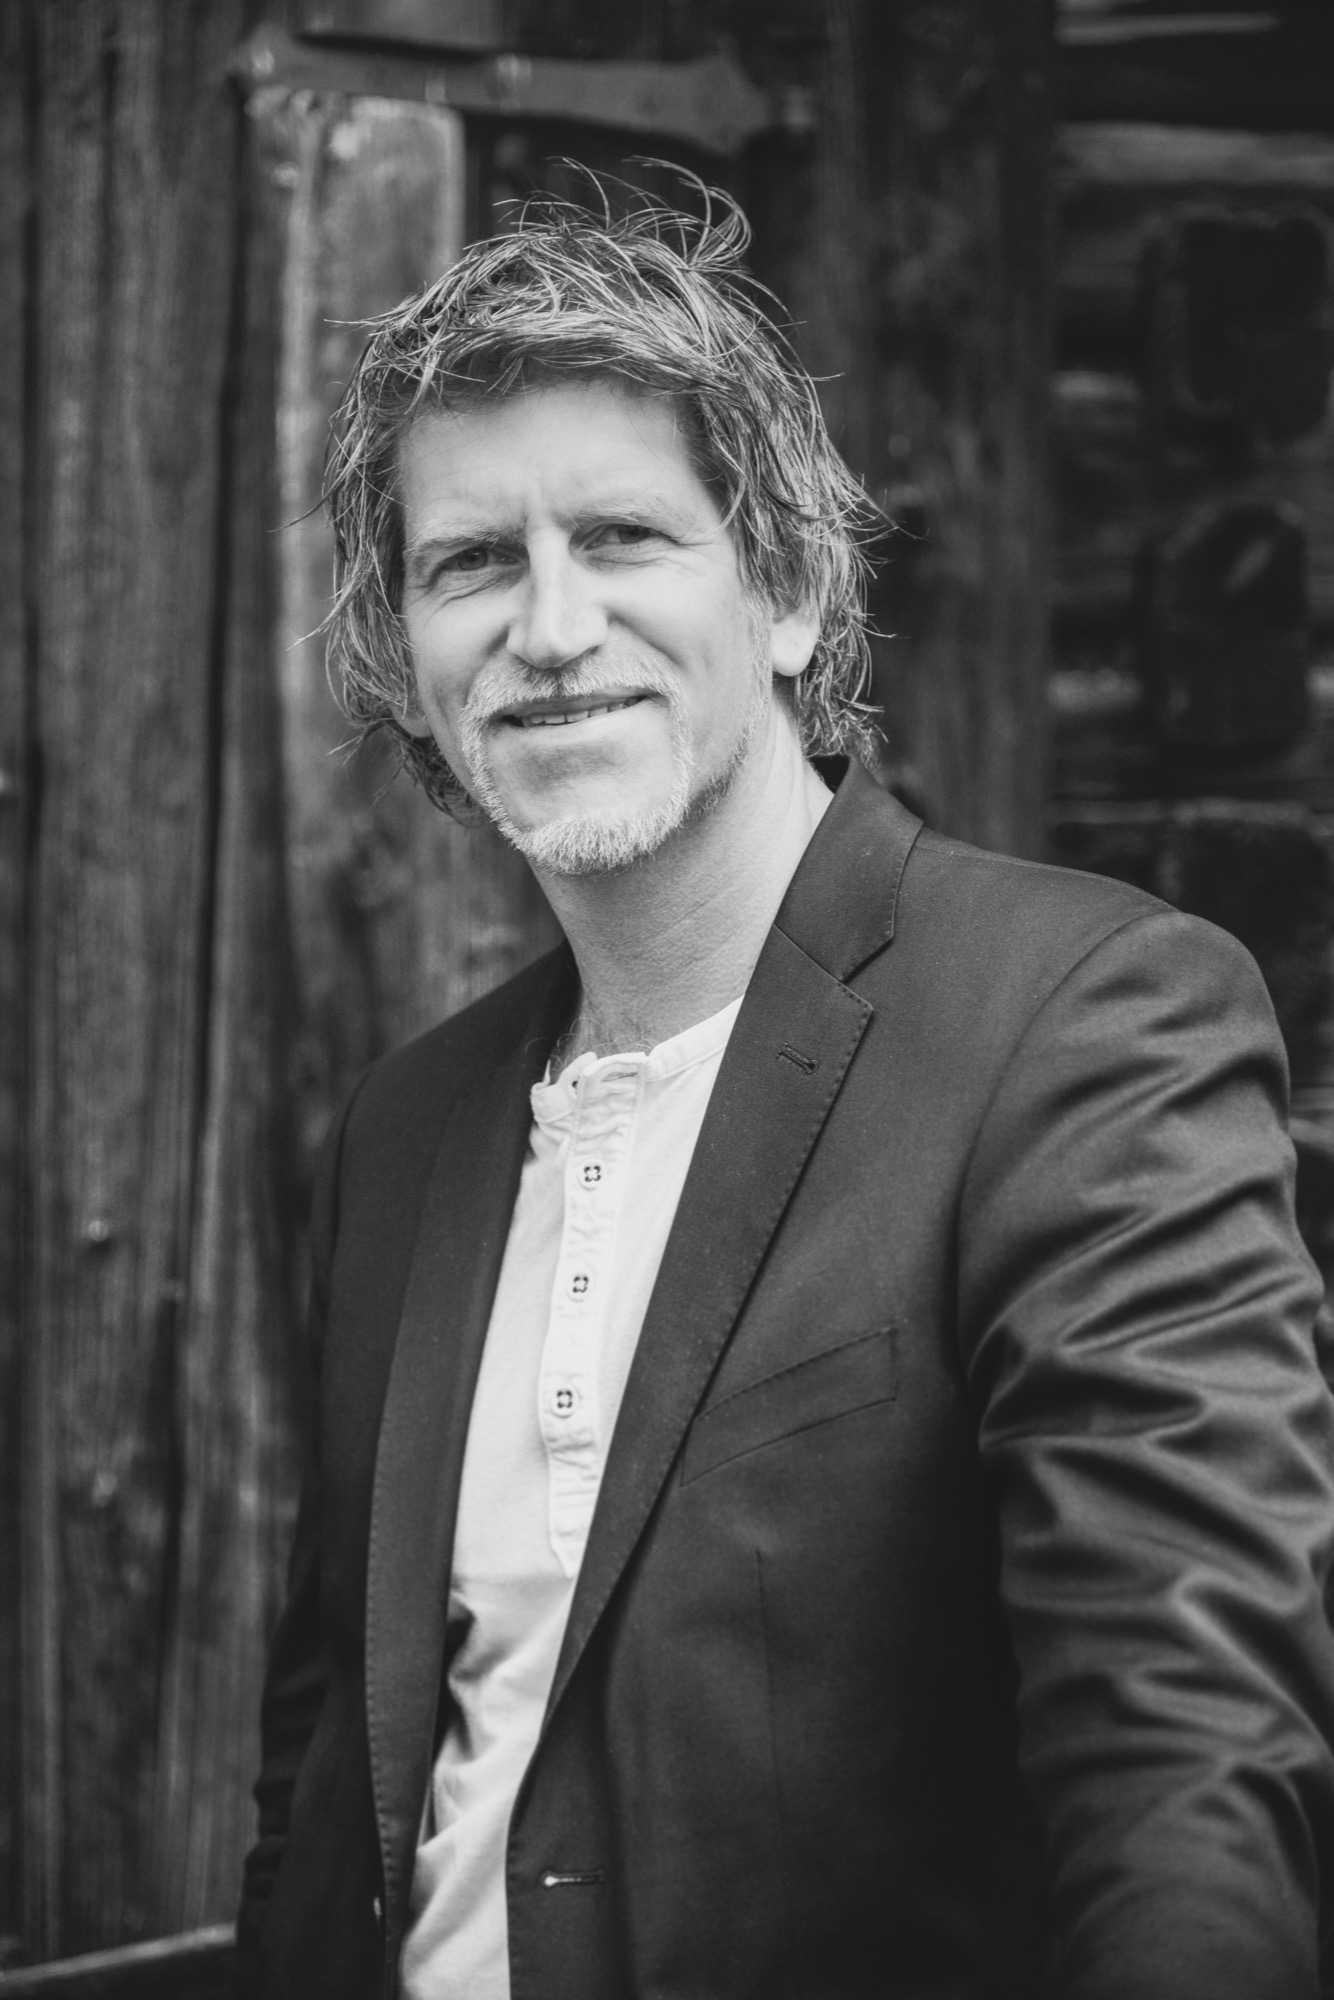 Architect Tom Lechner